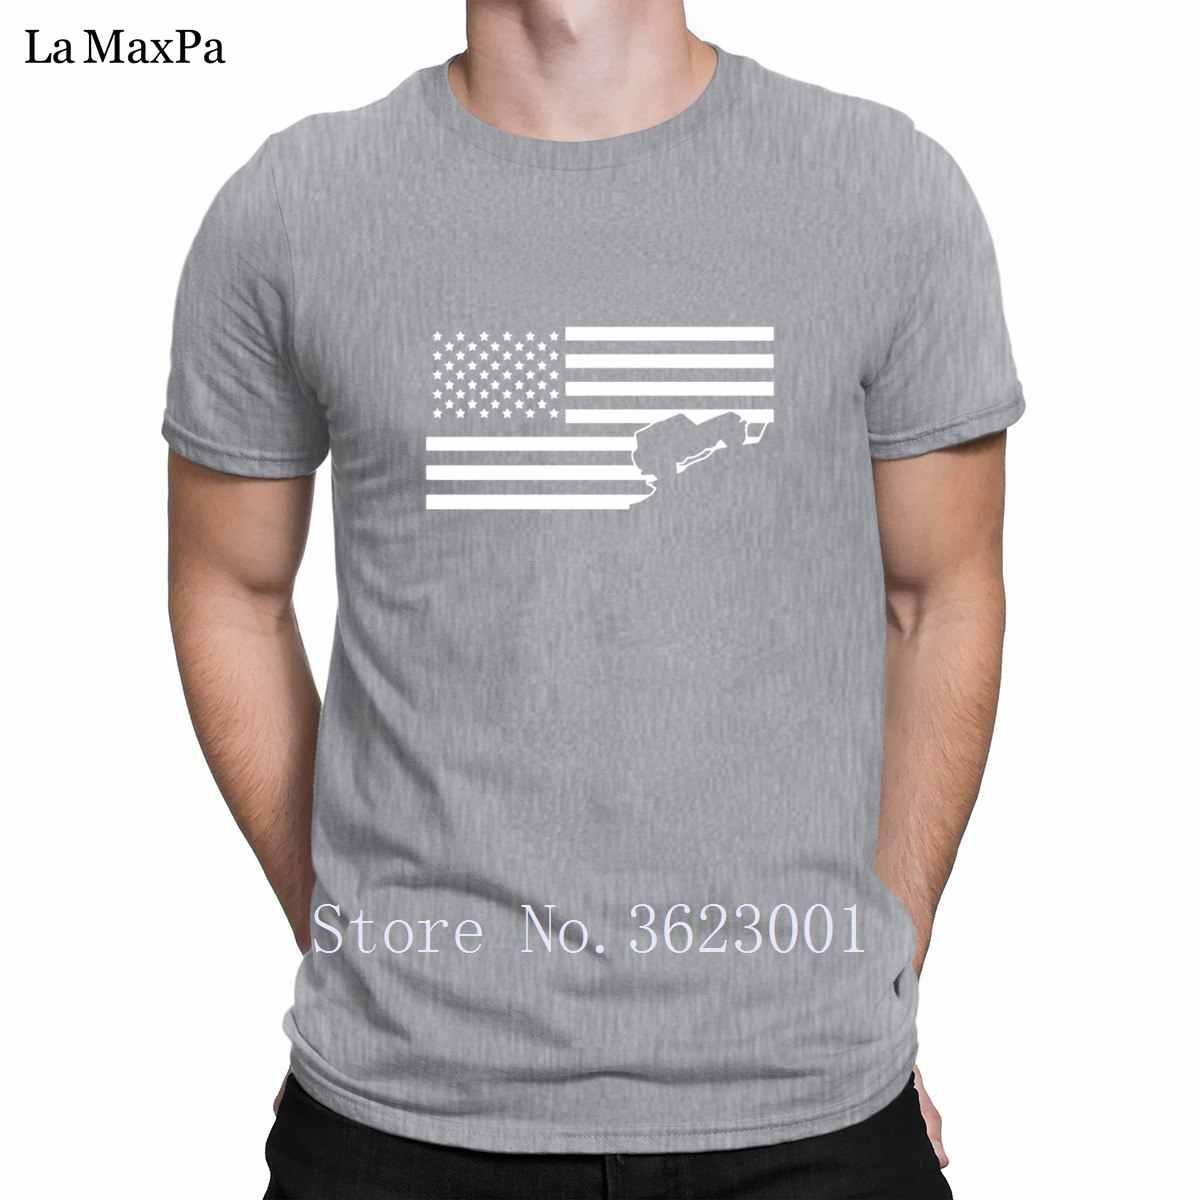 056cf4f46 ... Design Comical Tee Shirt Jeep America Men Tshirt Spring T-Shirt For Men  Branded T ...